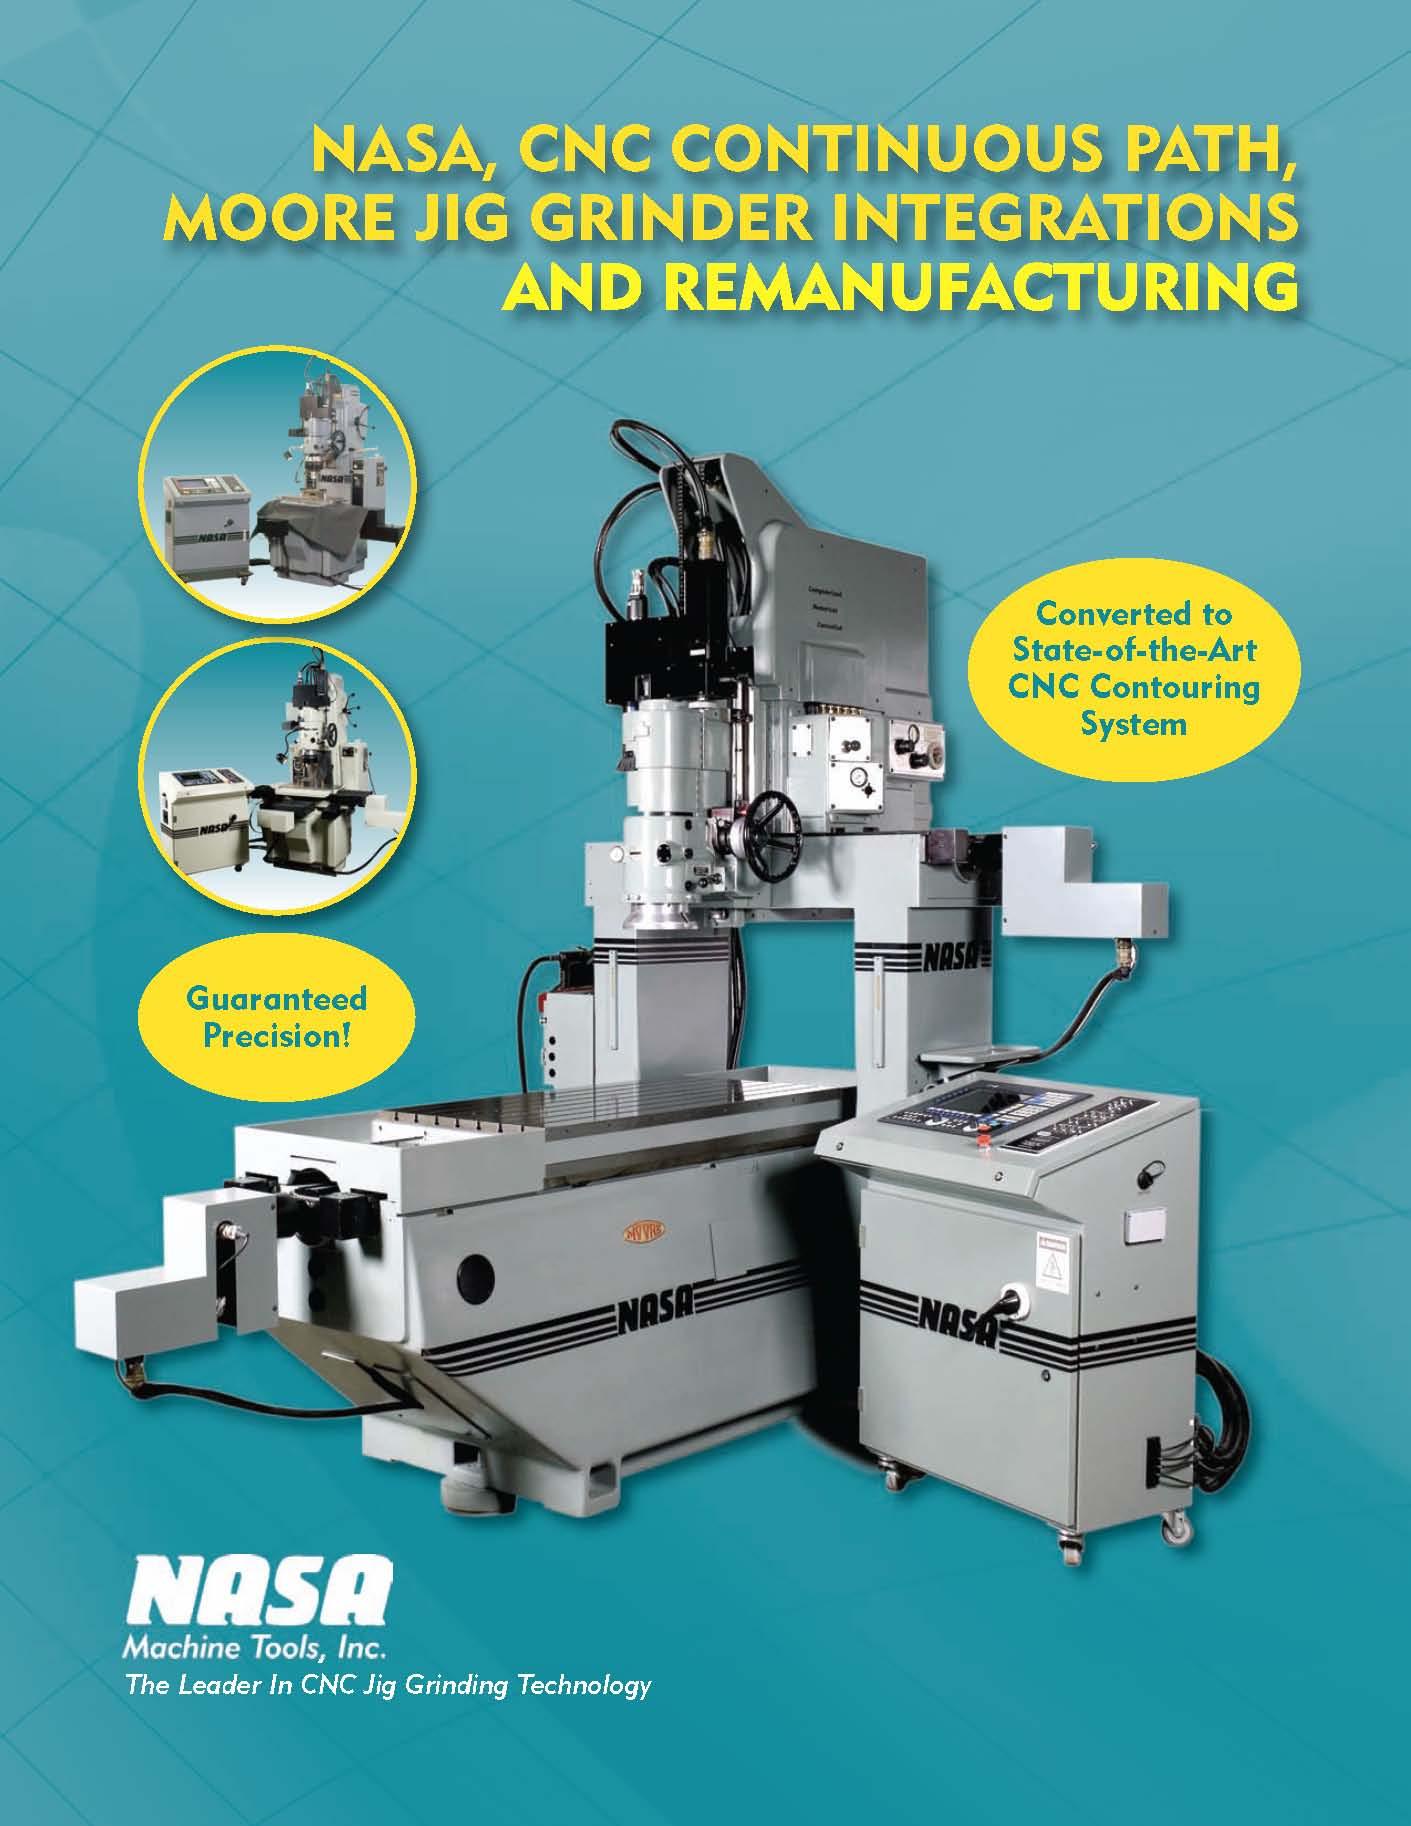 nasa machine tools